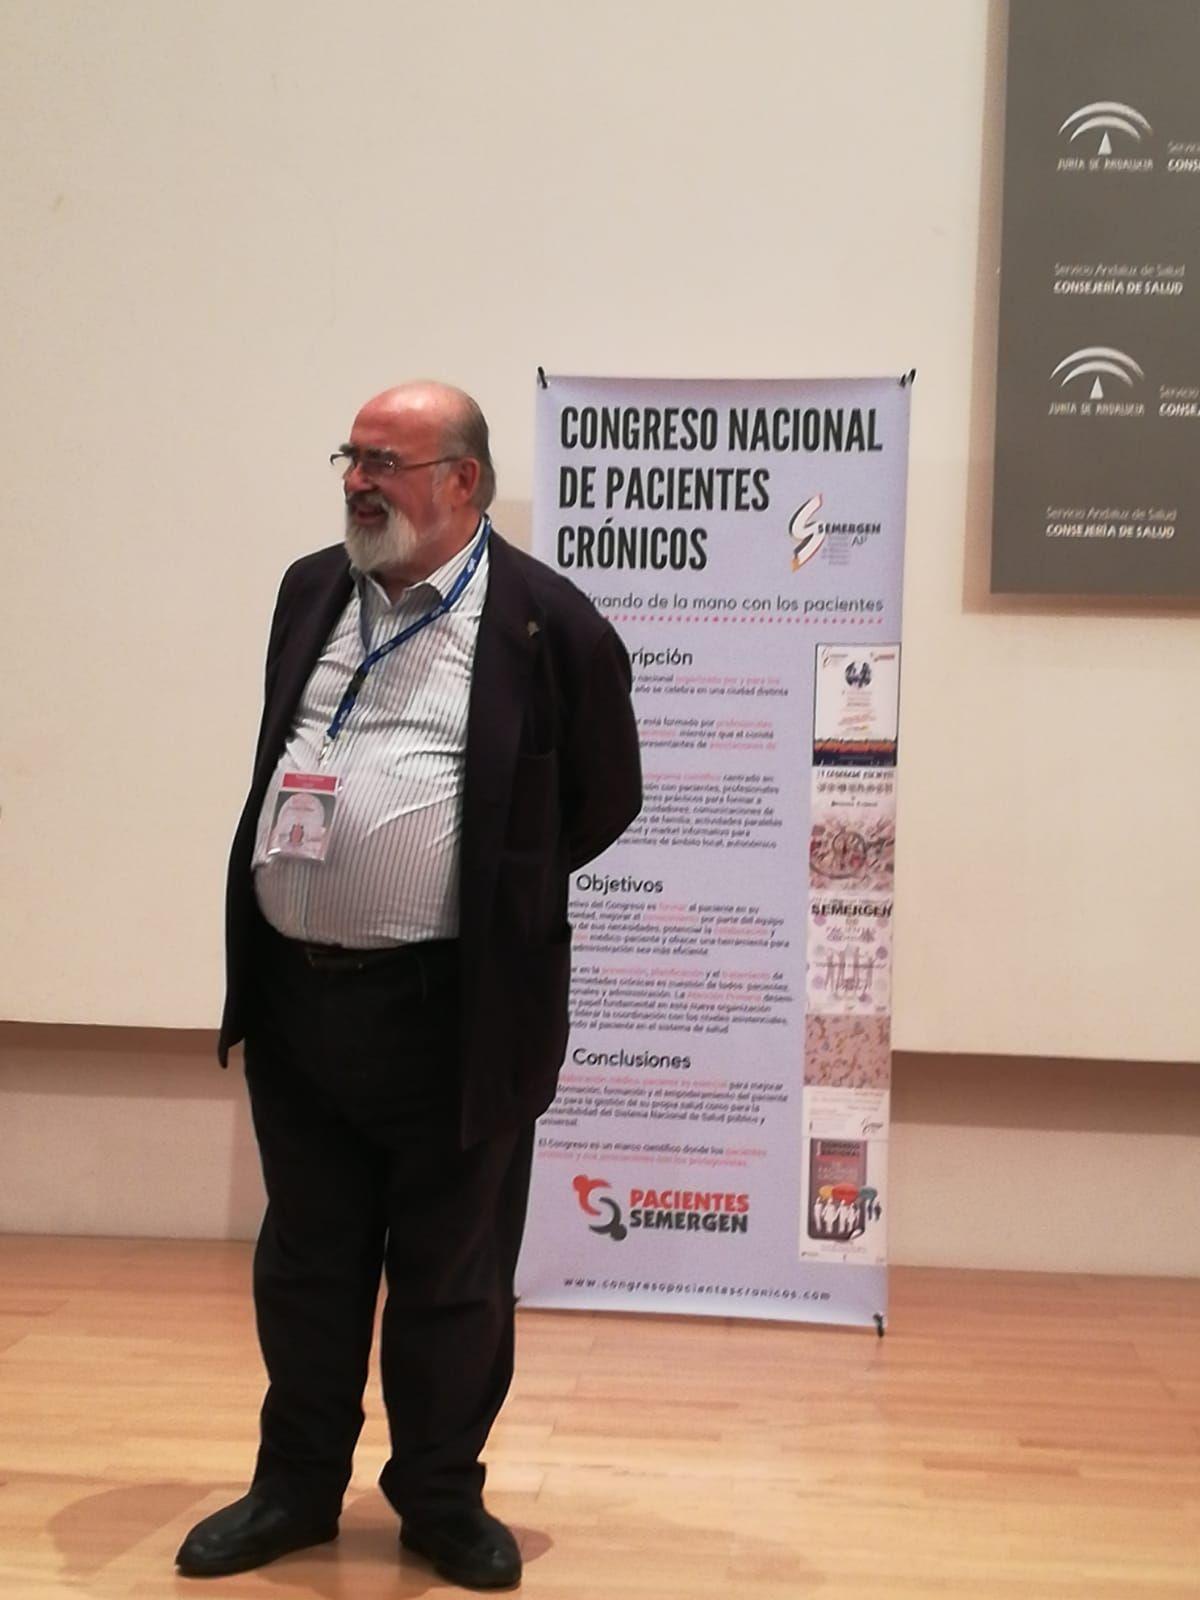 Congreso de Pacientes Crónicos de SEMERGEN en Córdoba